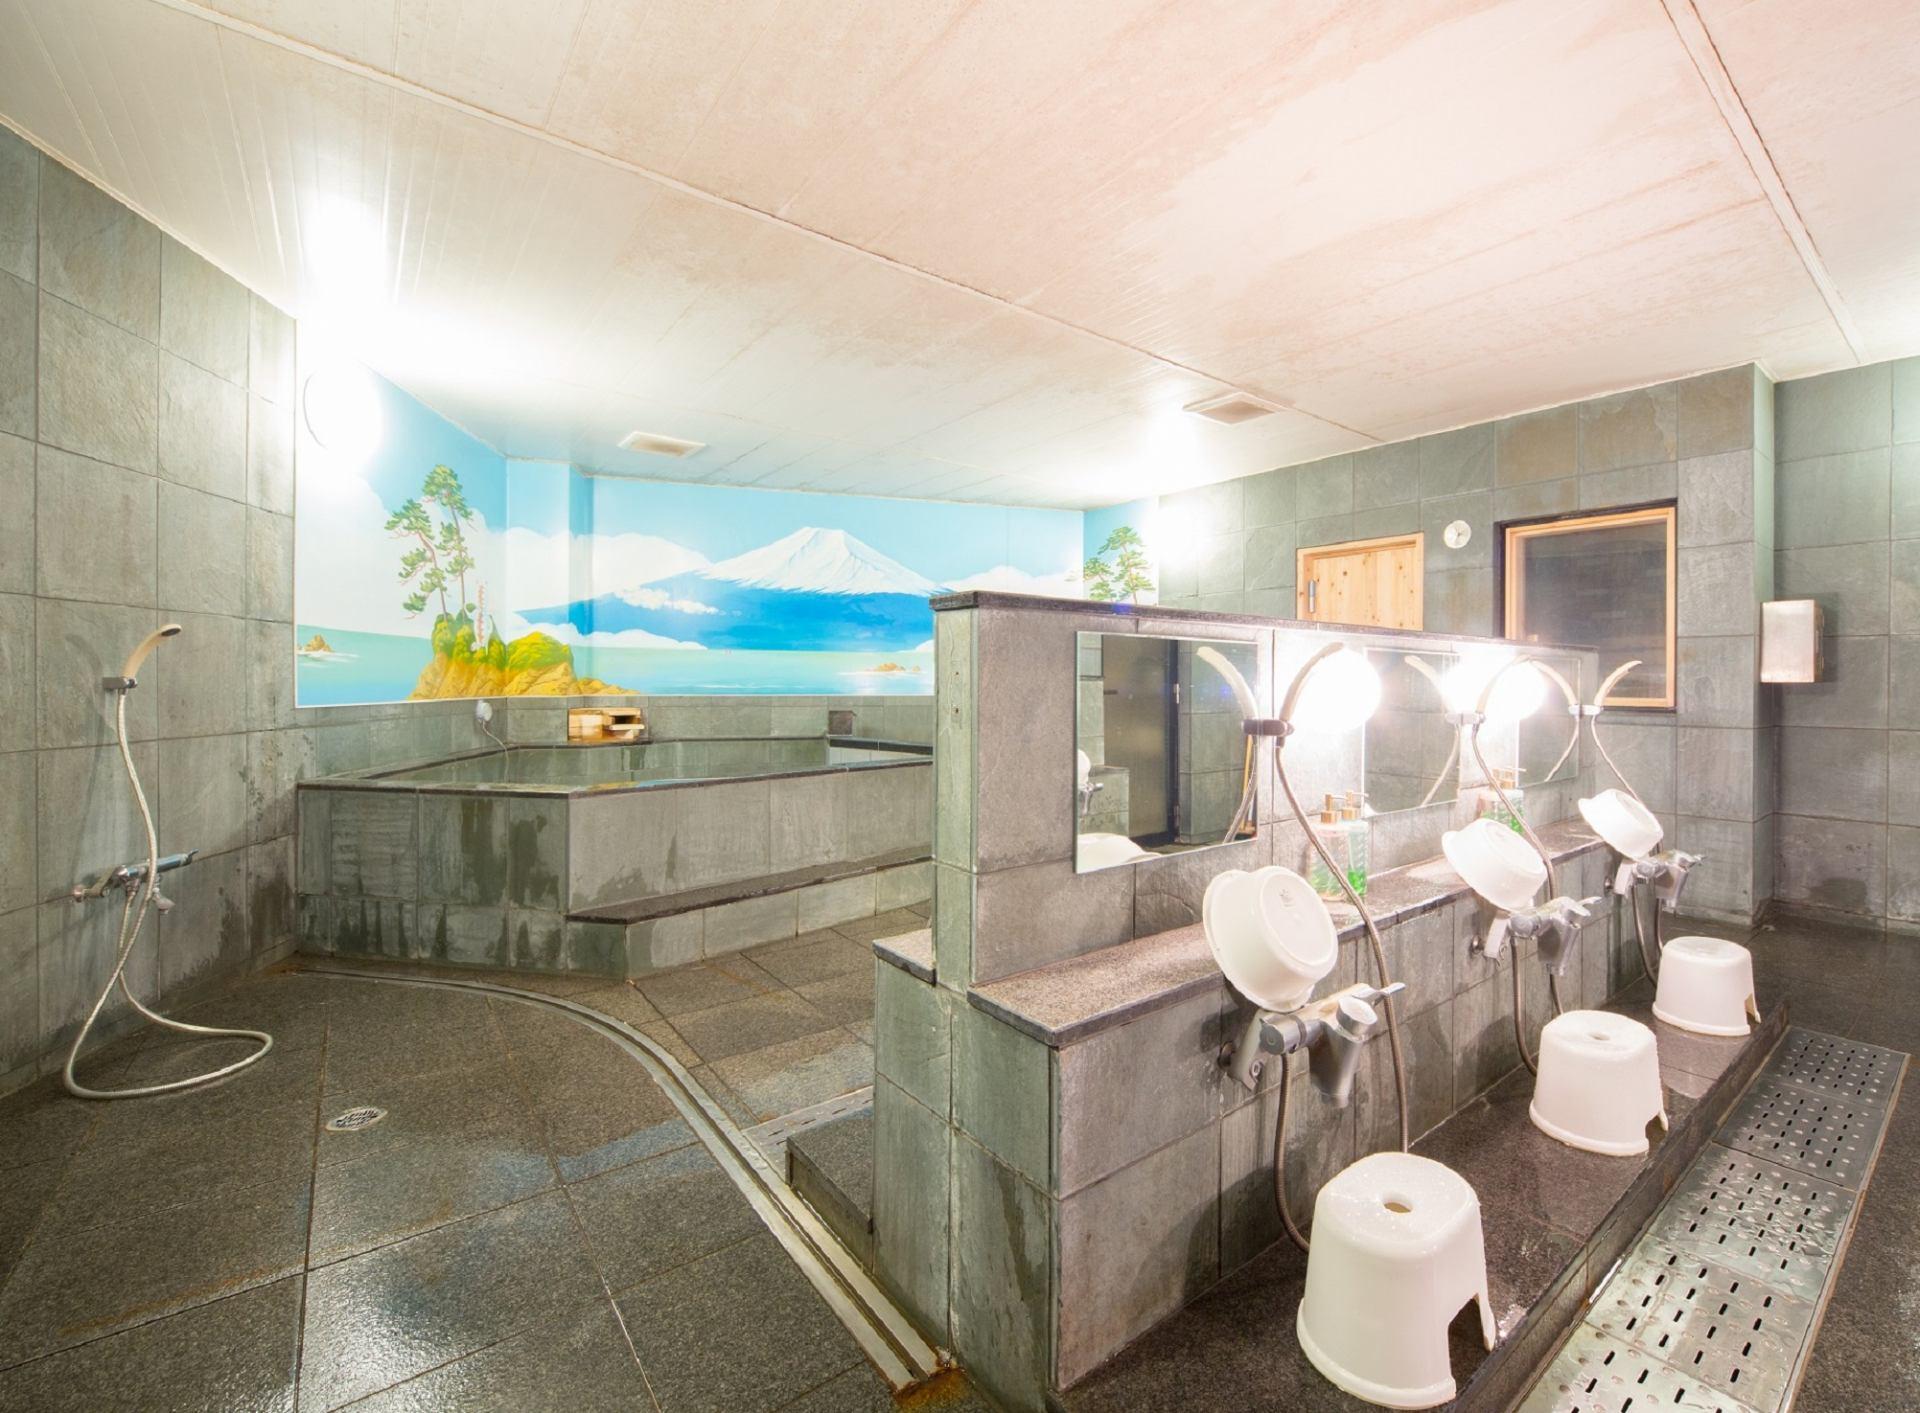 The public bath